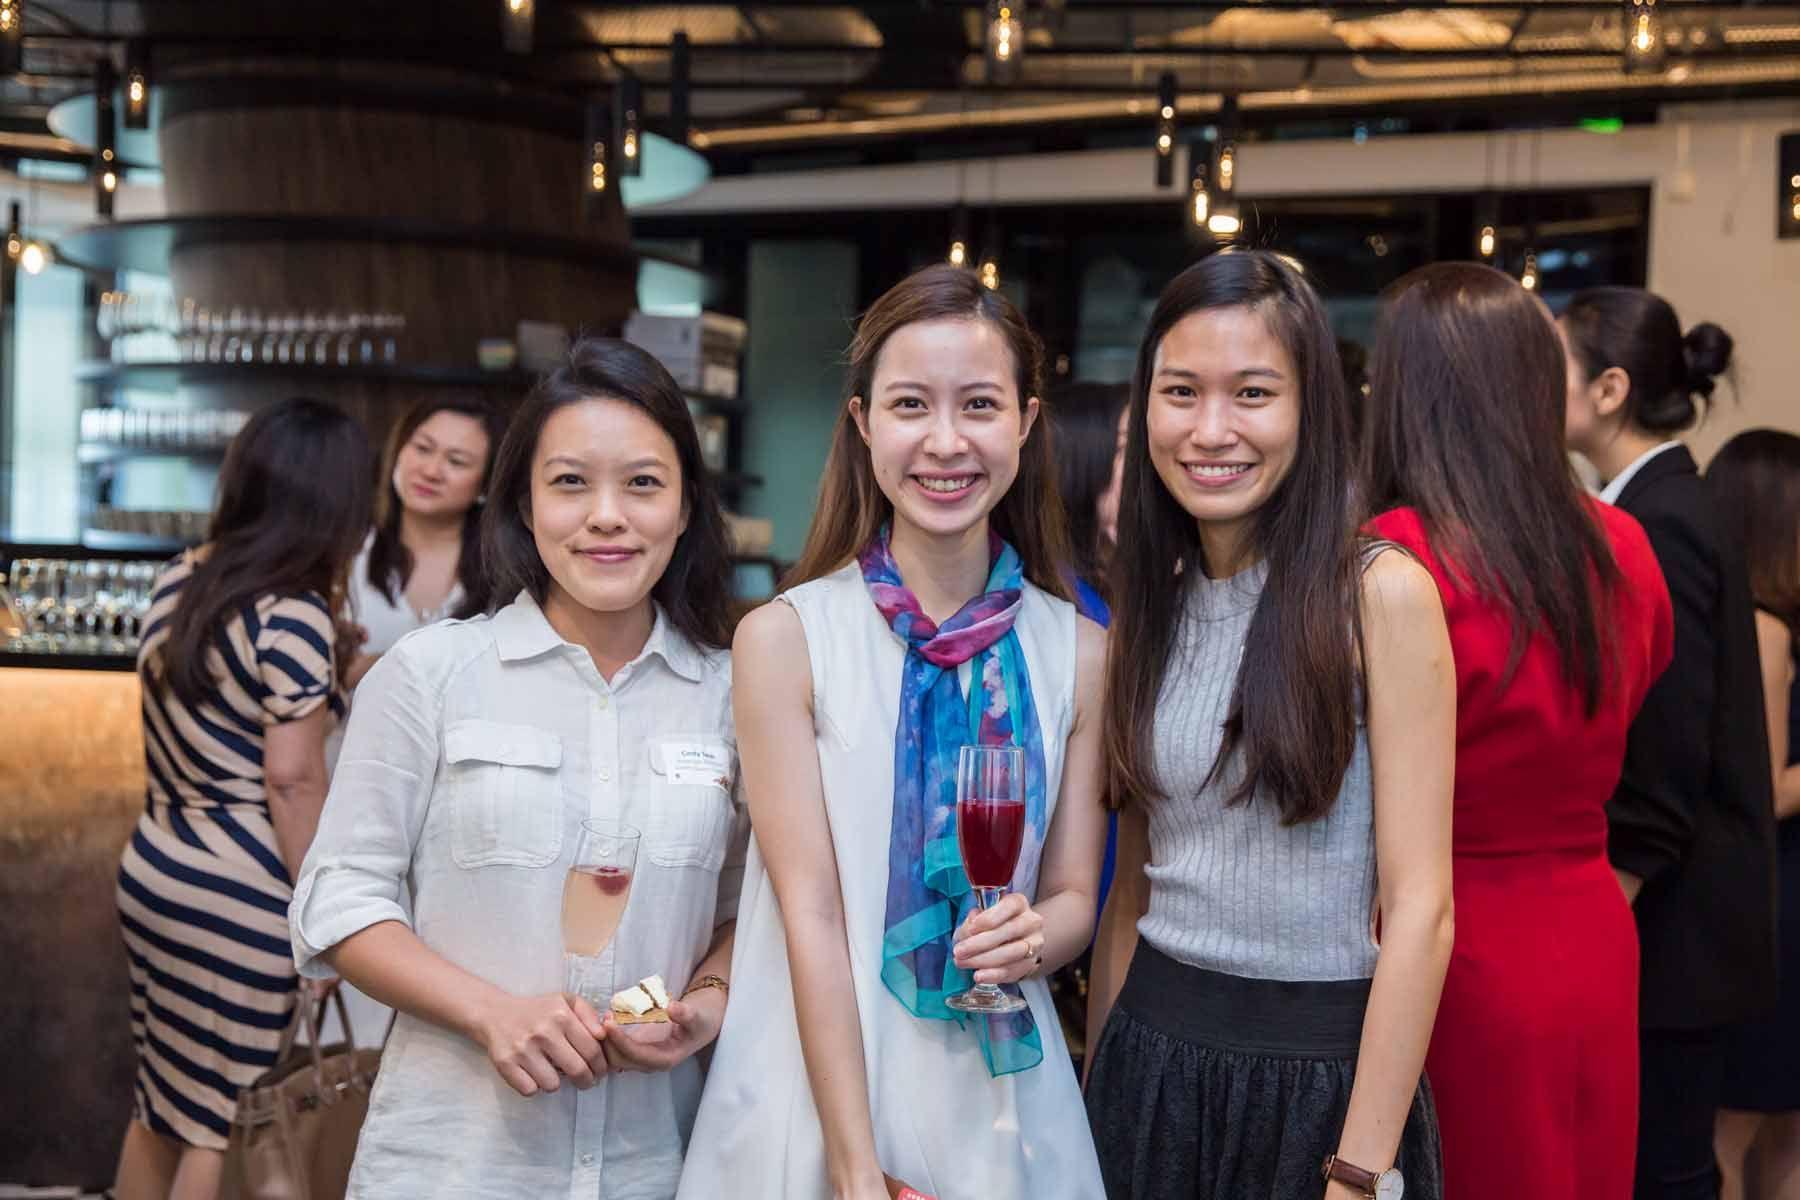 Cindy Teoh, Phuong Nguyen, Tan Peck Ying